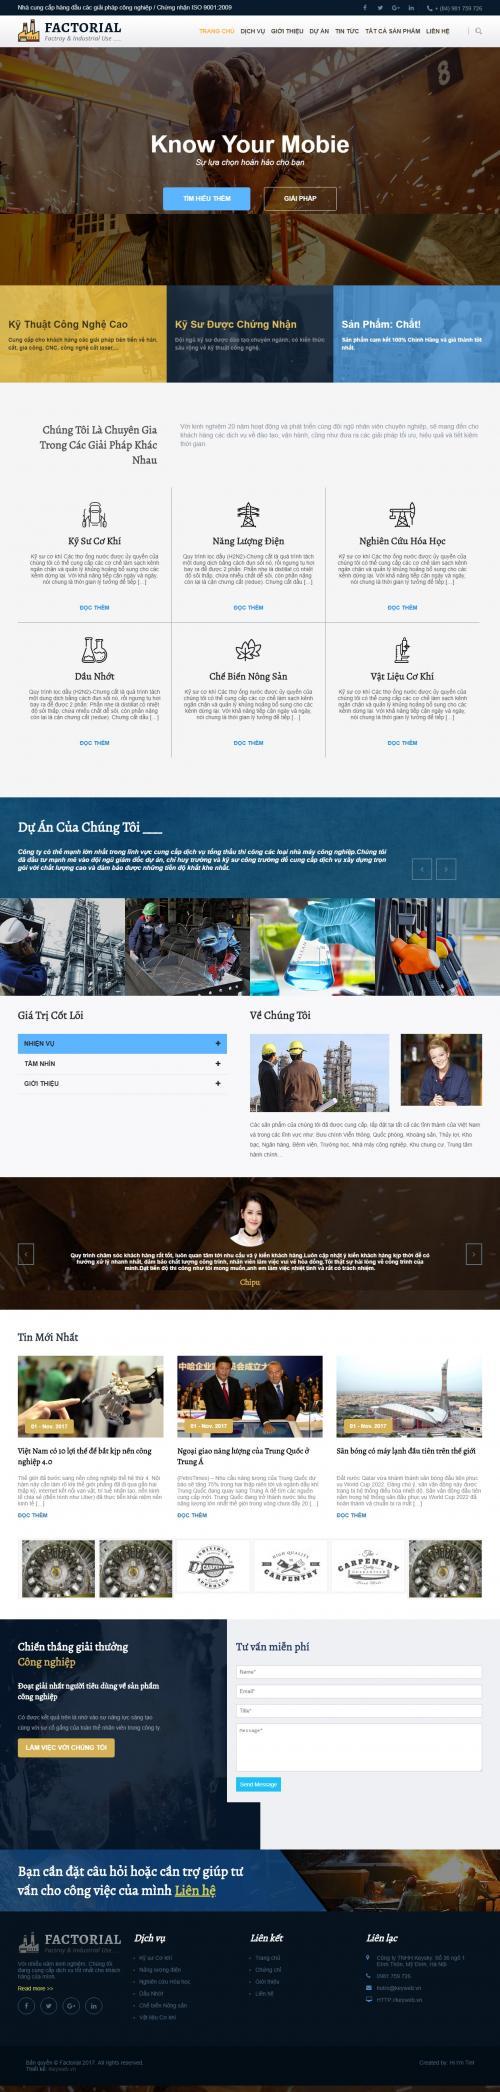 Thiết kế website công ty xây dựng 2